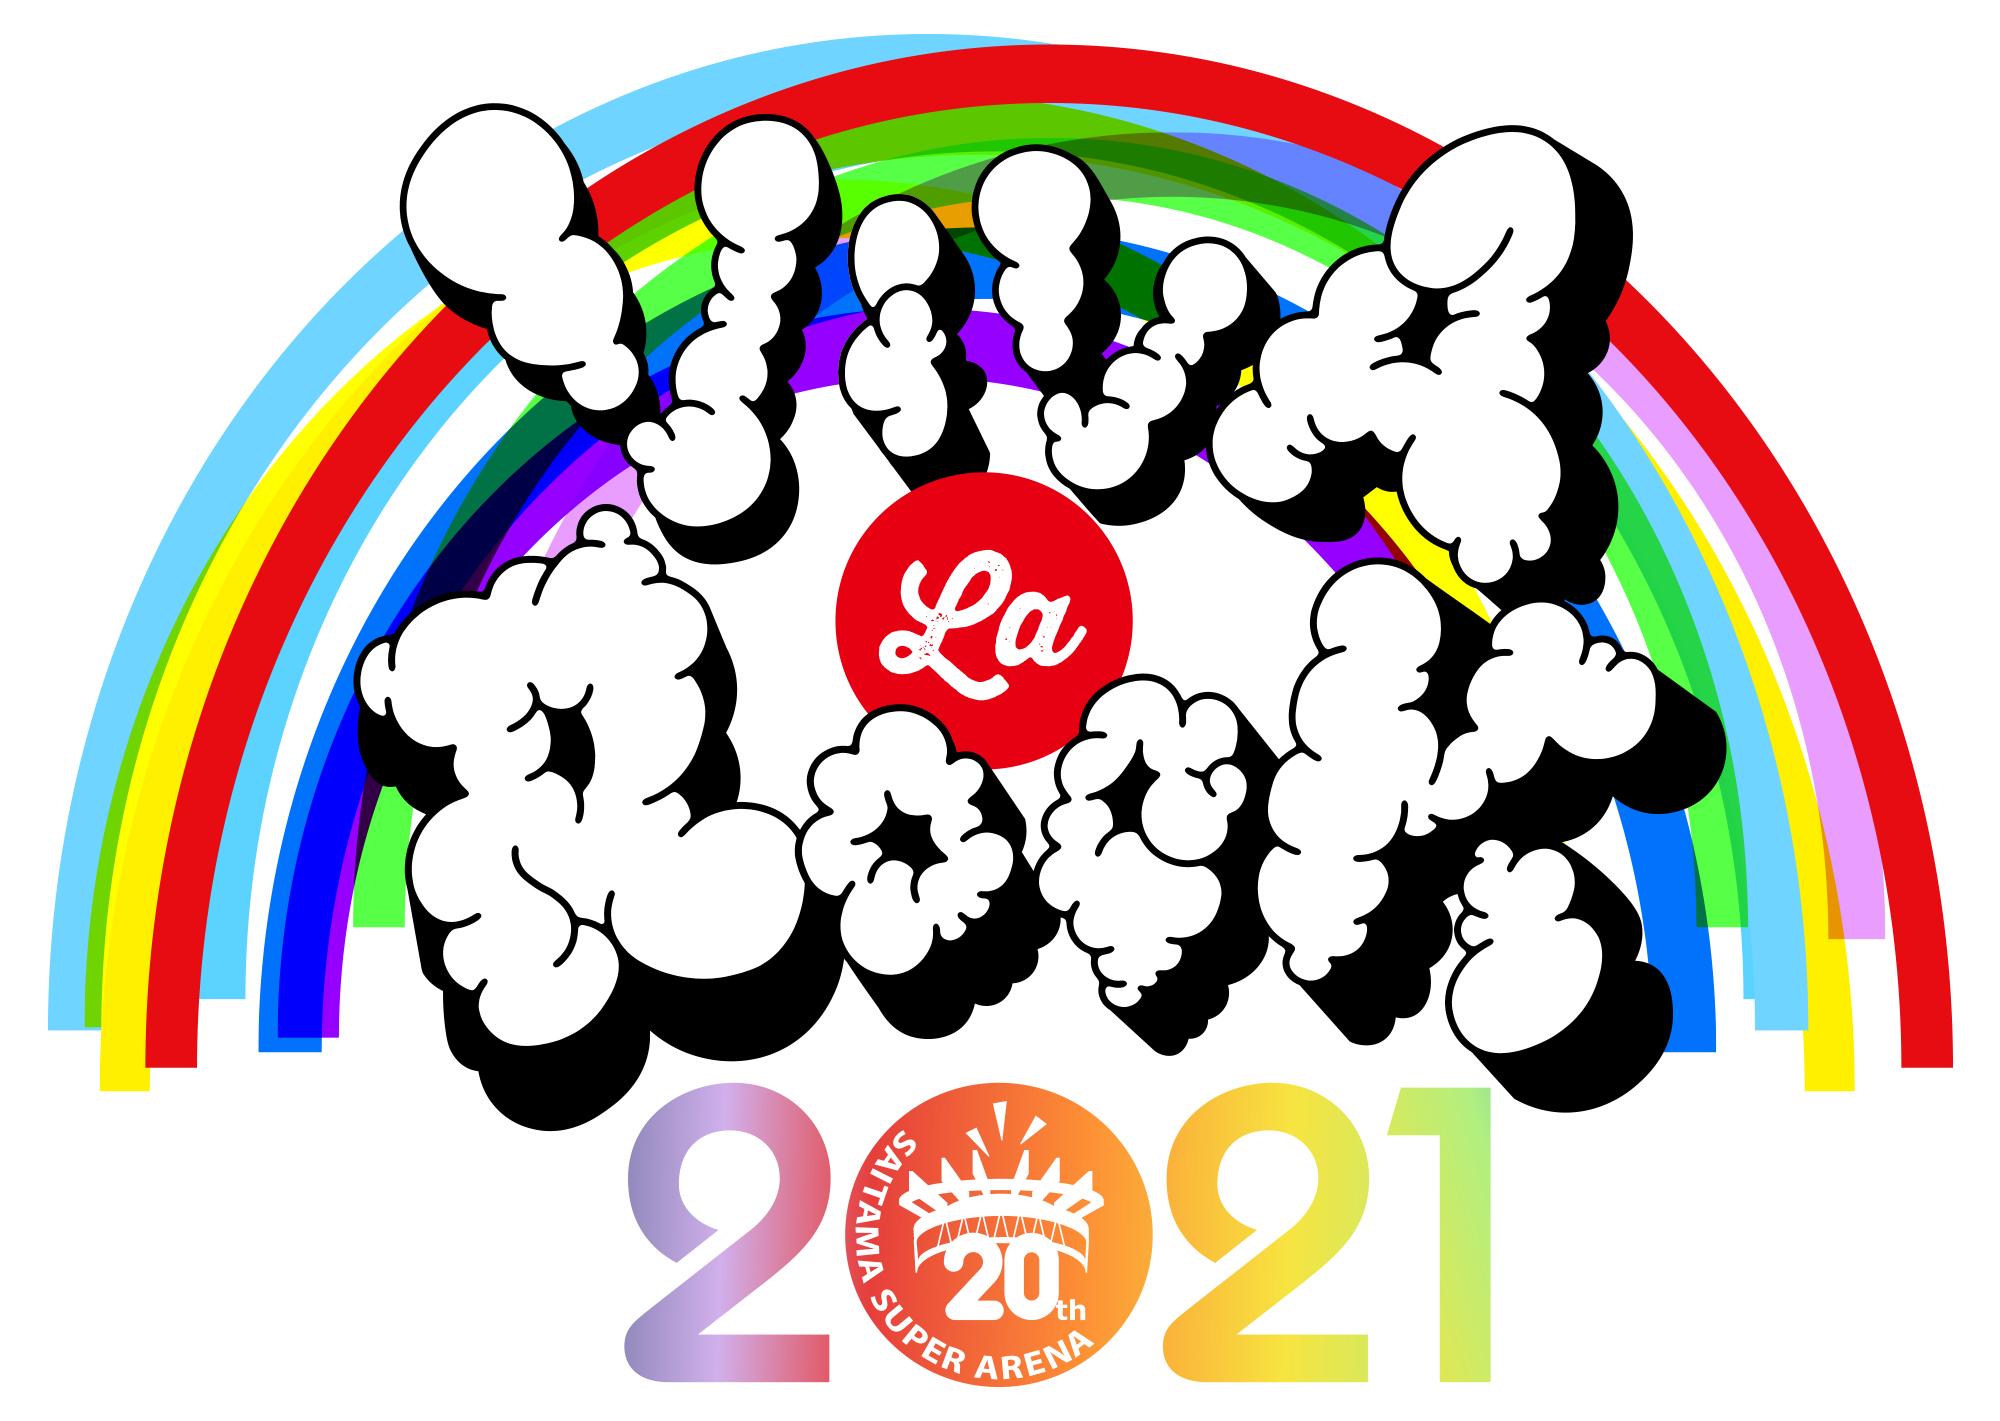 【VIVA LA ROCK 2021】2021年5月1日(土)-5日(水)開催  第1弾出演アーティスト51組も発表(#ビバラ)